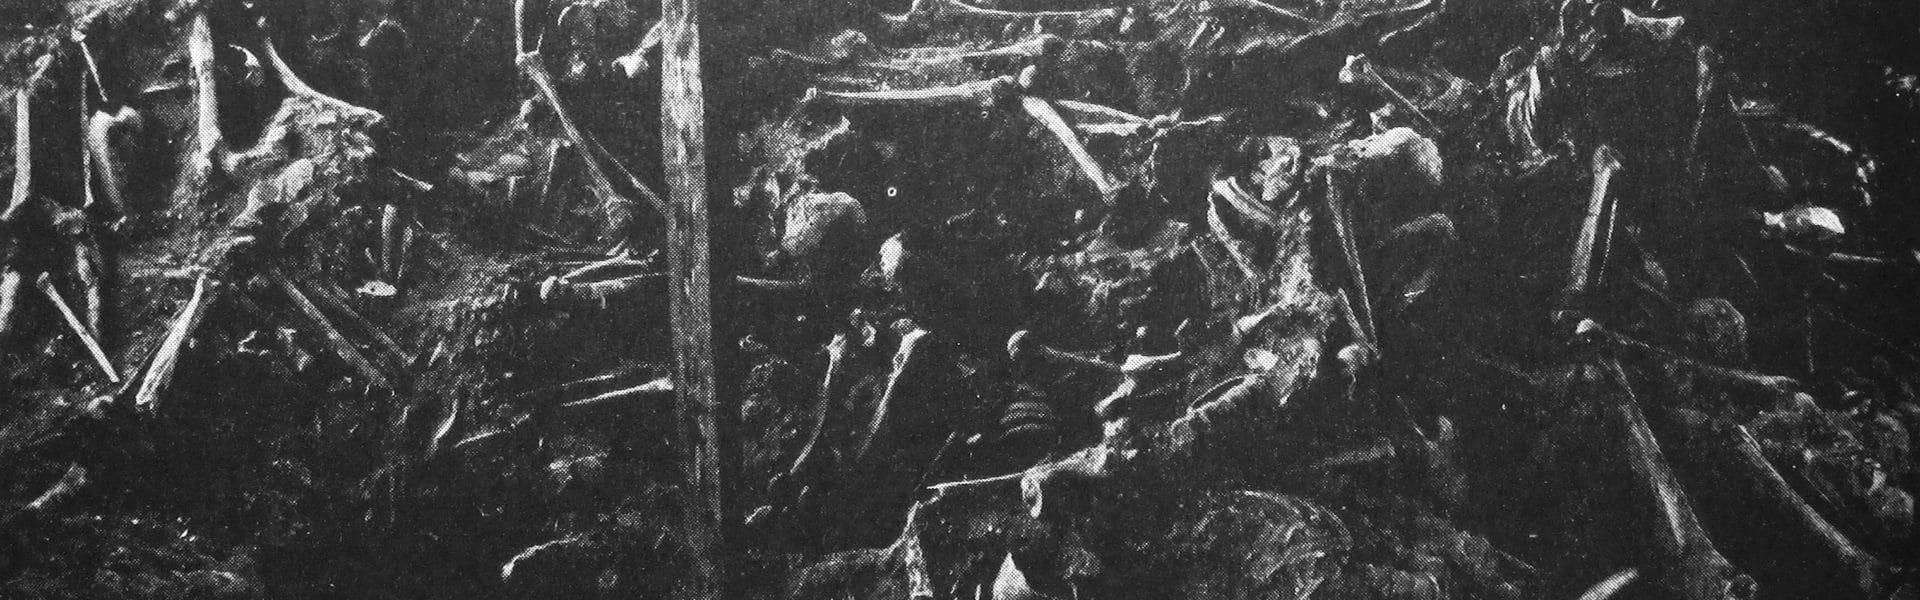 Massgravarna vid Visby